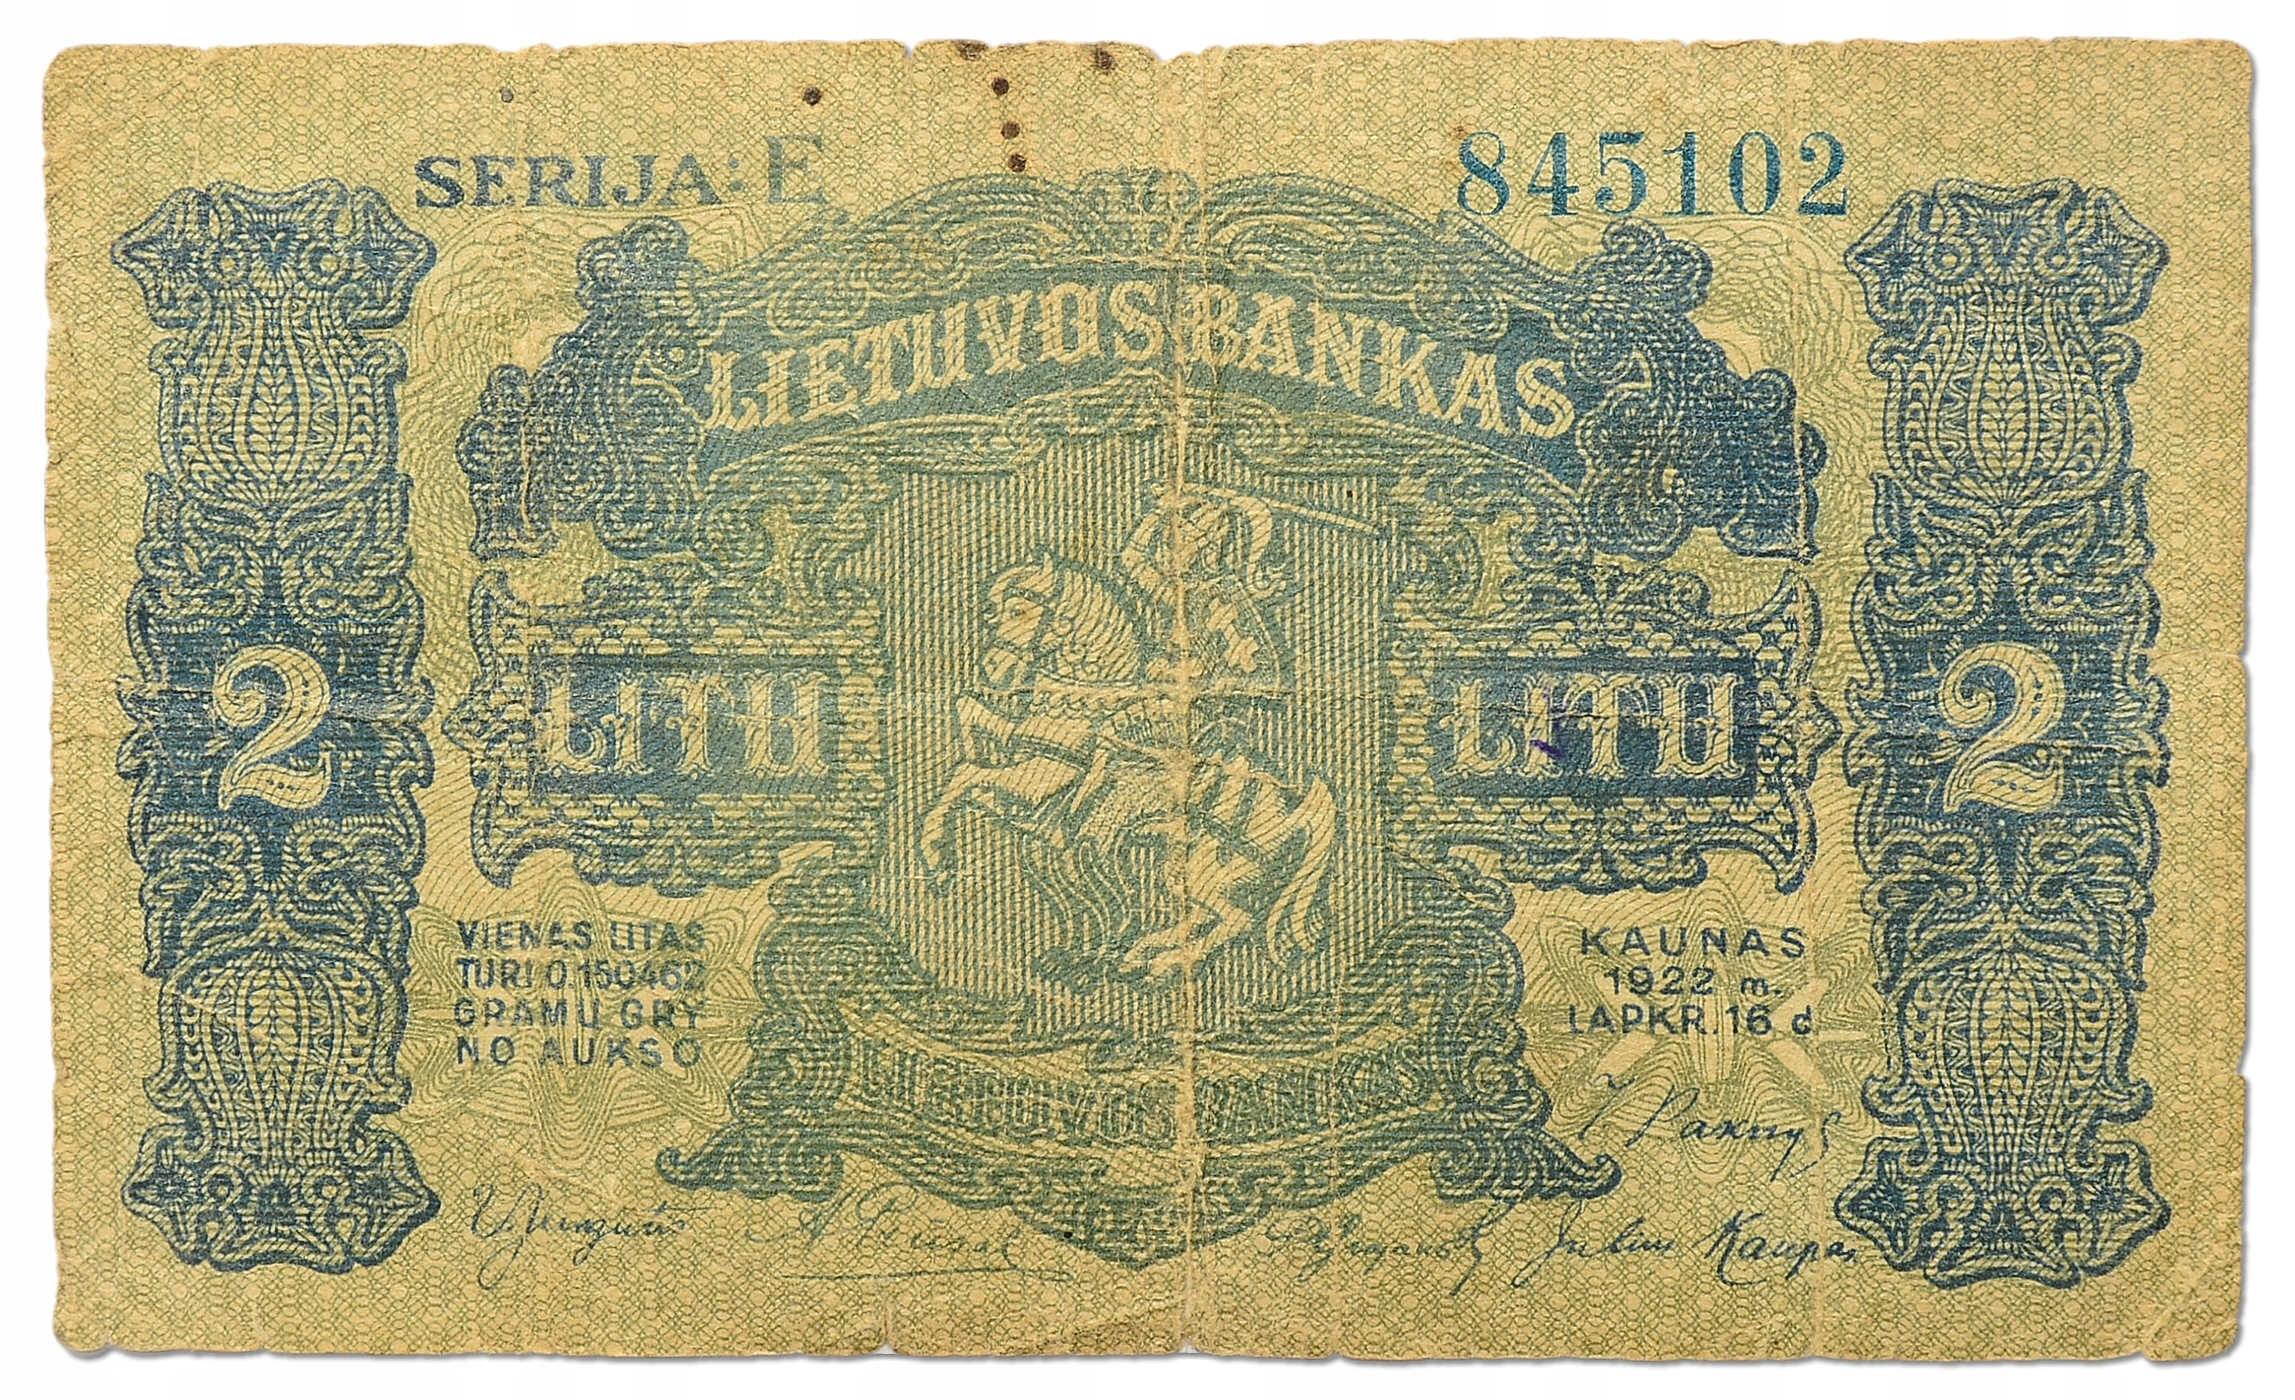 31.Litwa, 2 Lity 1922 b.rzadki, P.14.a, St.3-